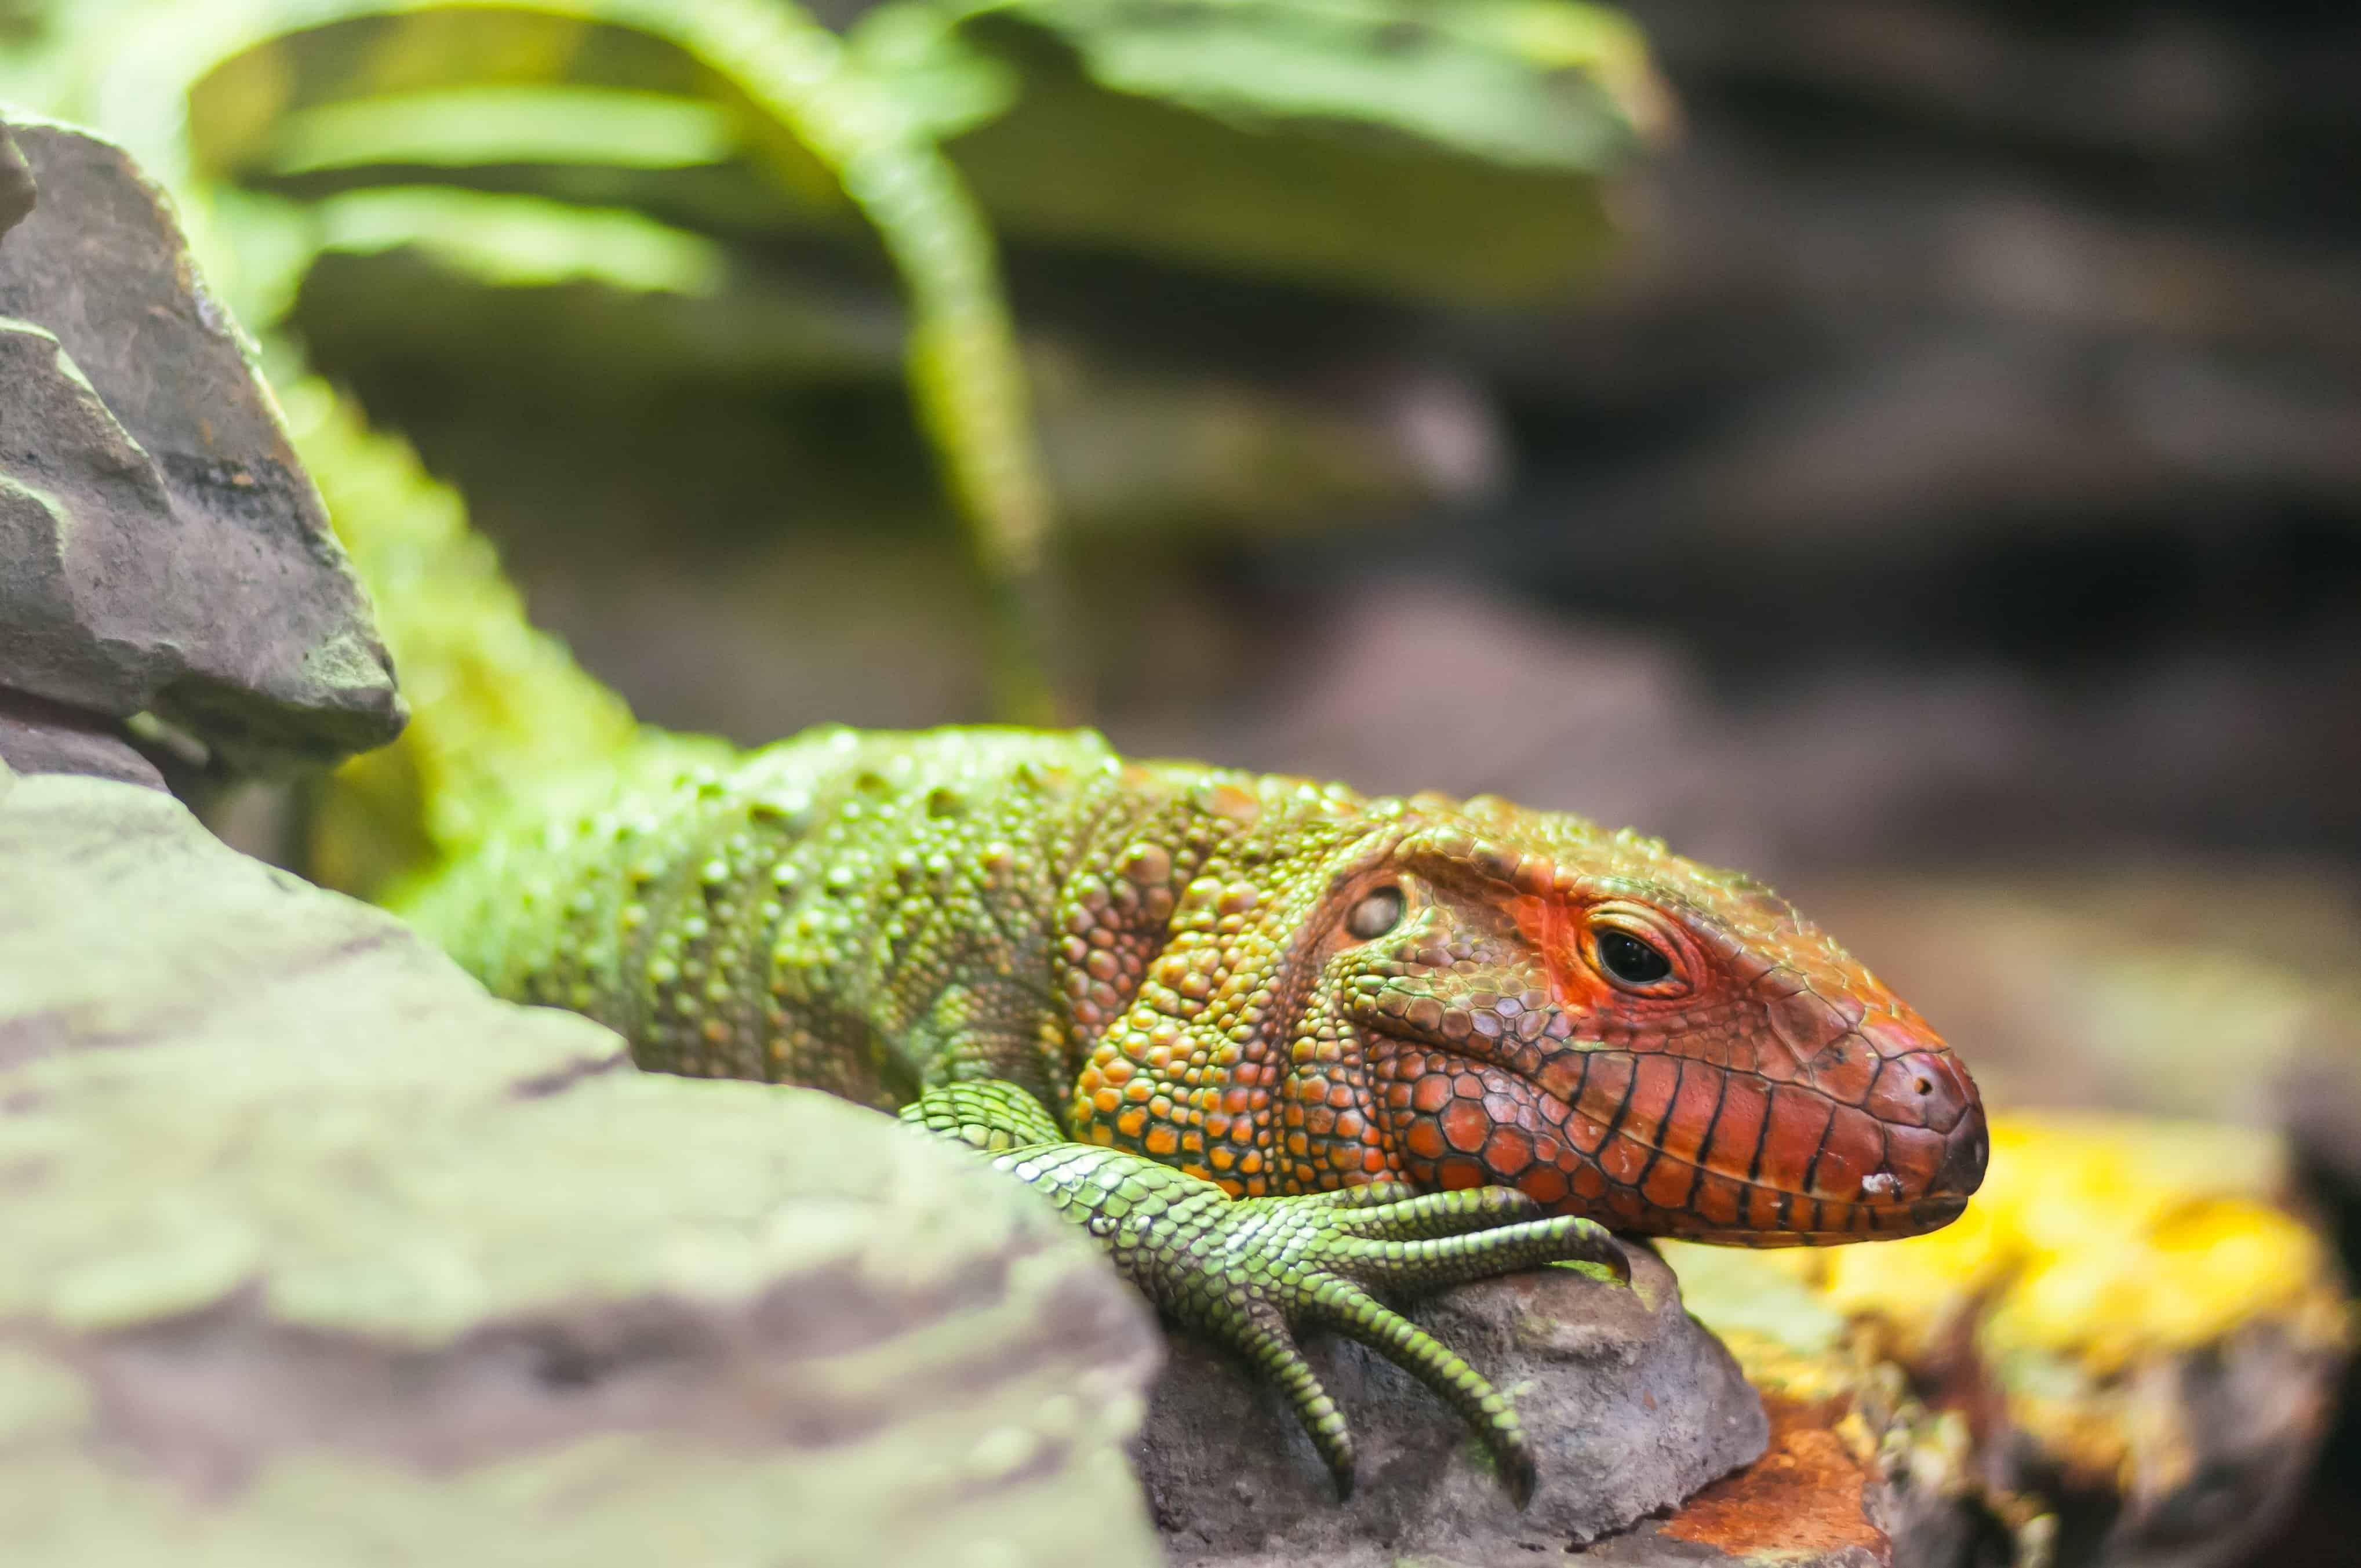 colorful lizard exotic animal iguana reptile nature dragon wildlife reptiles animals lizards geckos amphibians